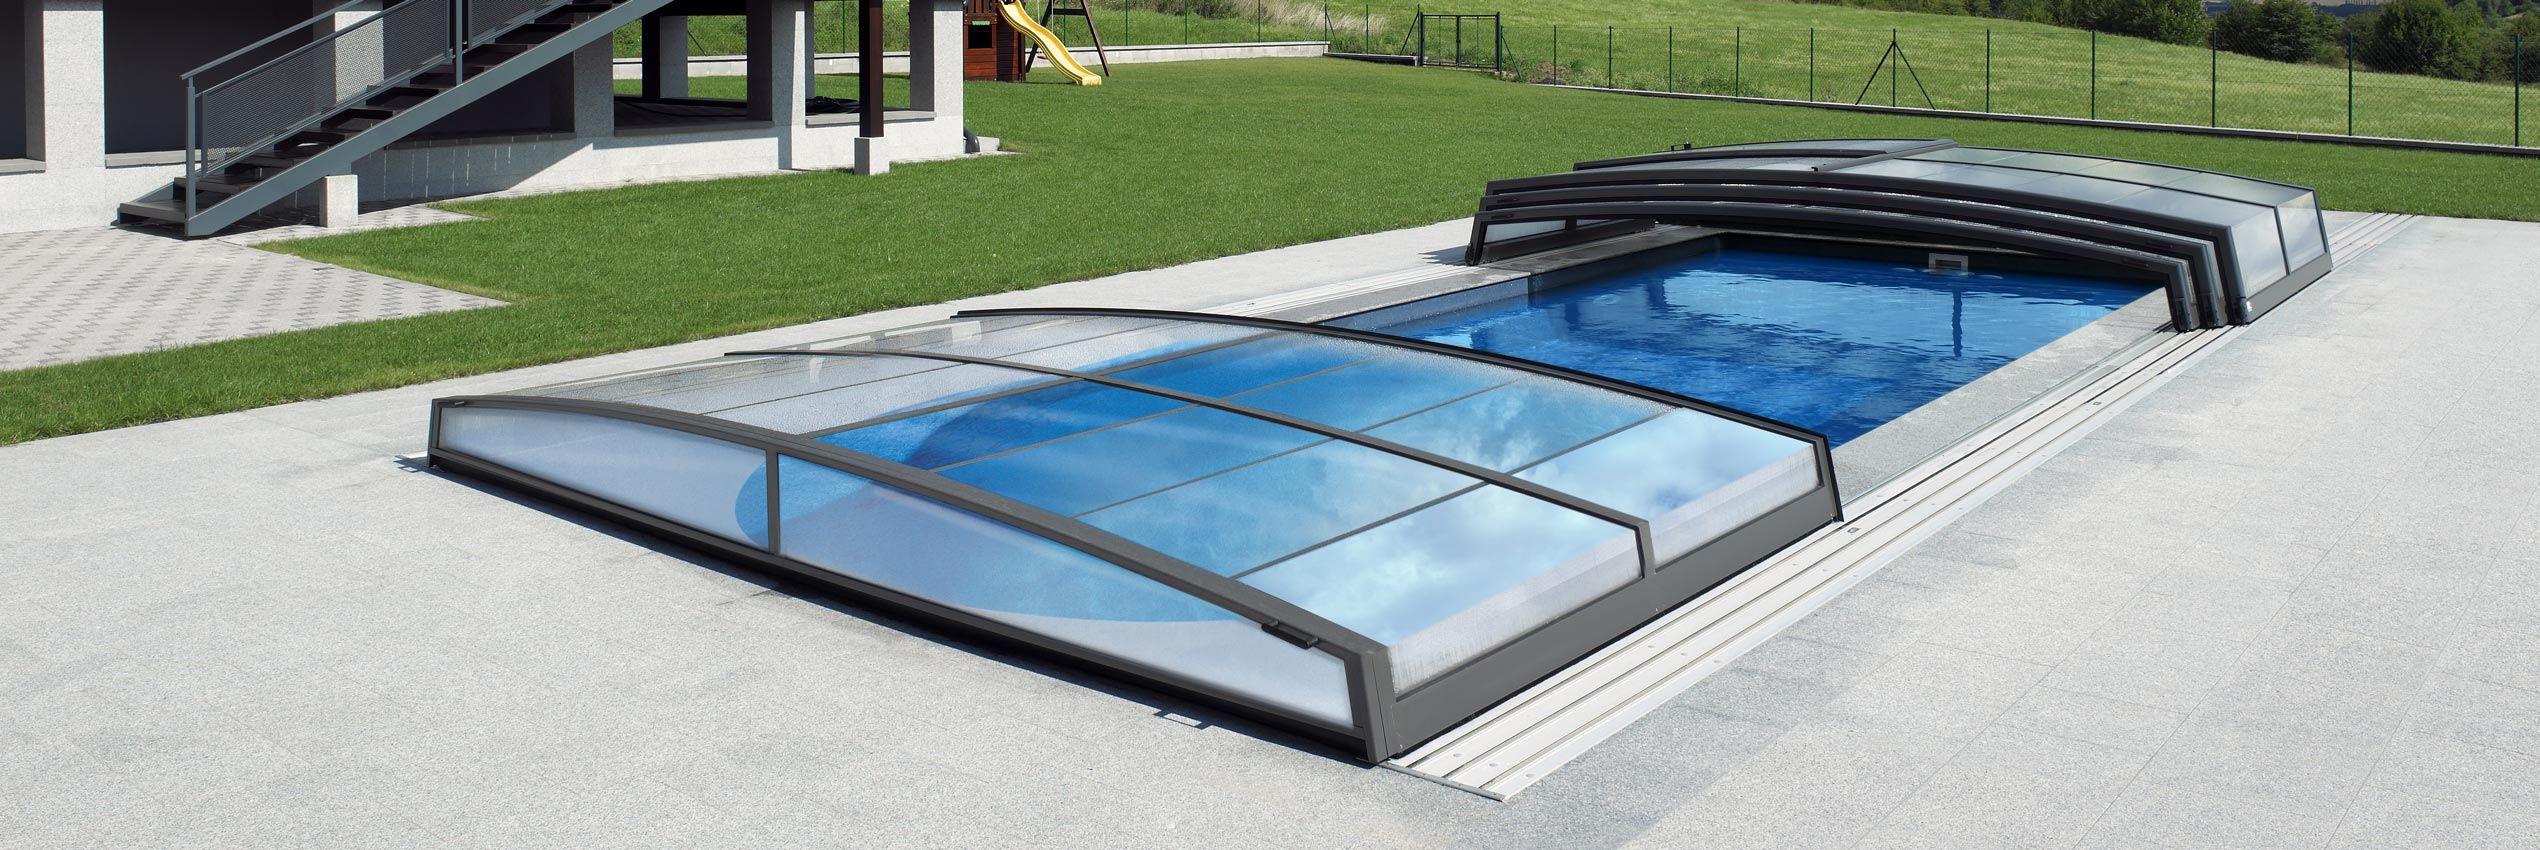 Acoperiri retractabile de mica inaltime pentru piscine for Acoperiri piscine